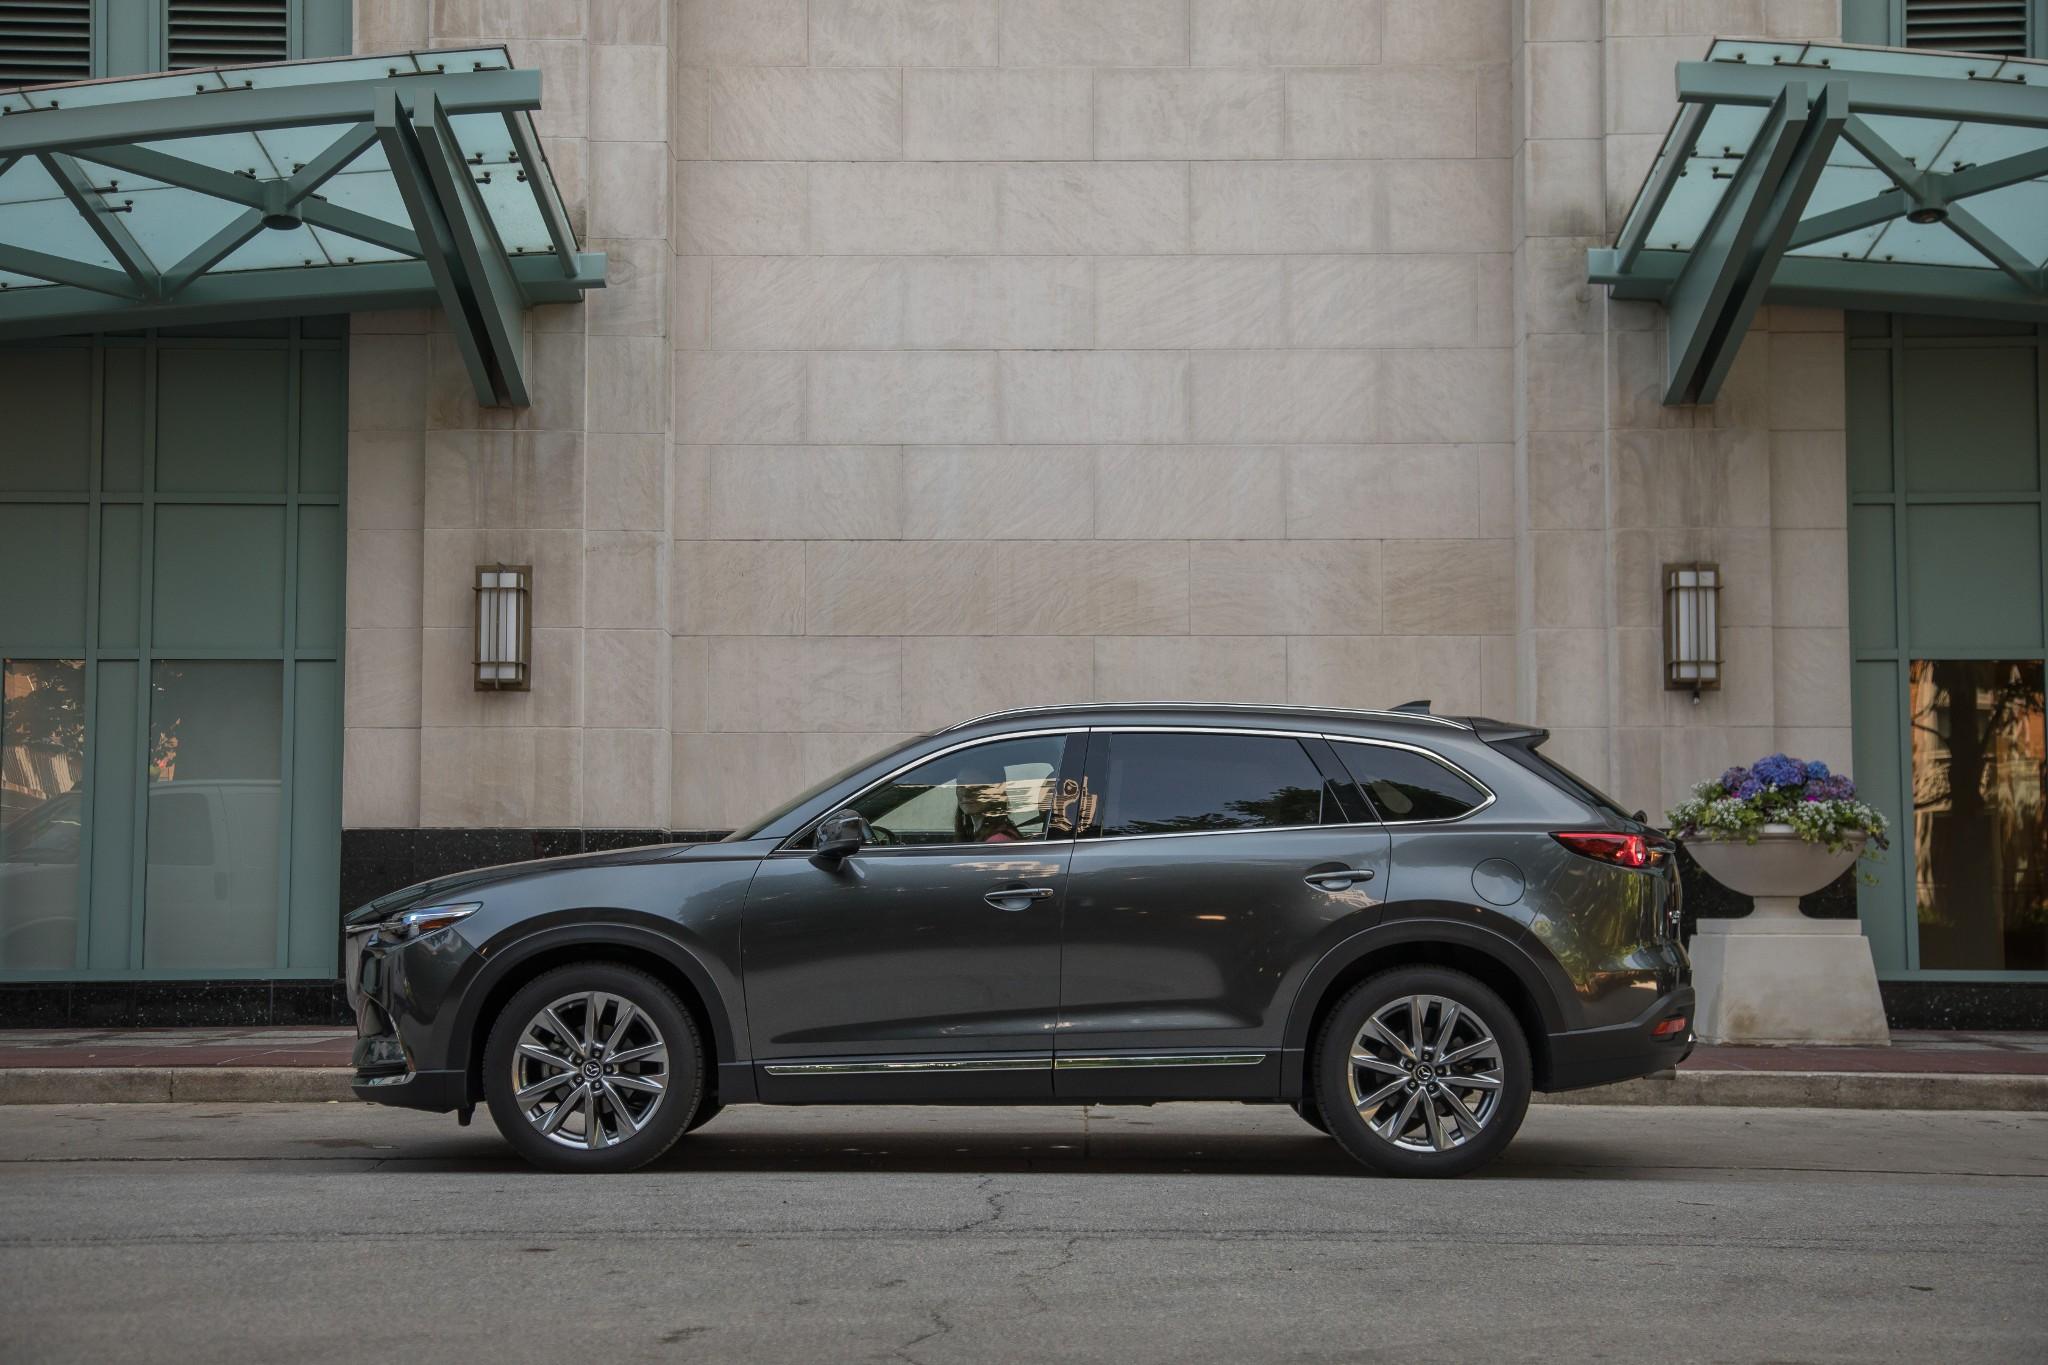 2020 Mazda CX-9 Improves Crash Safety Ratings With Headlight Upgrade